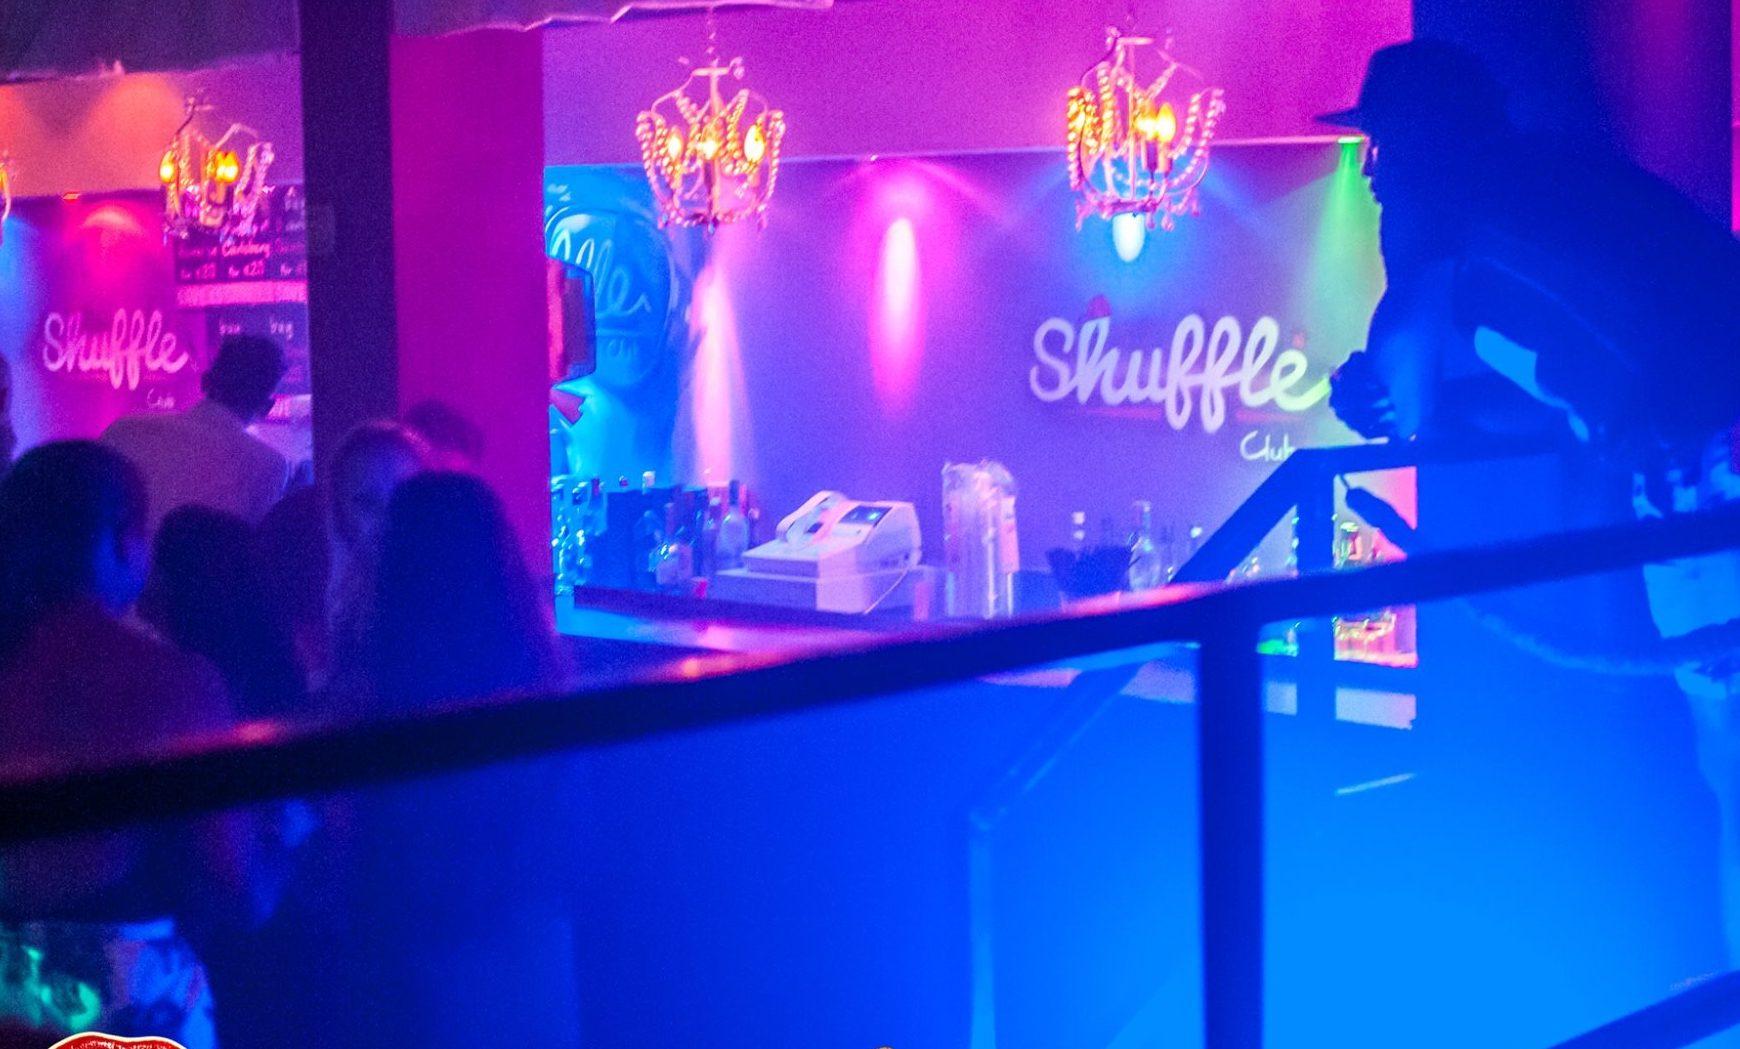 FLIRT @ CLUB SHUFFLE